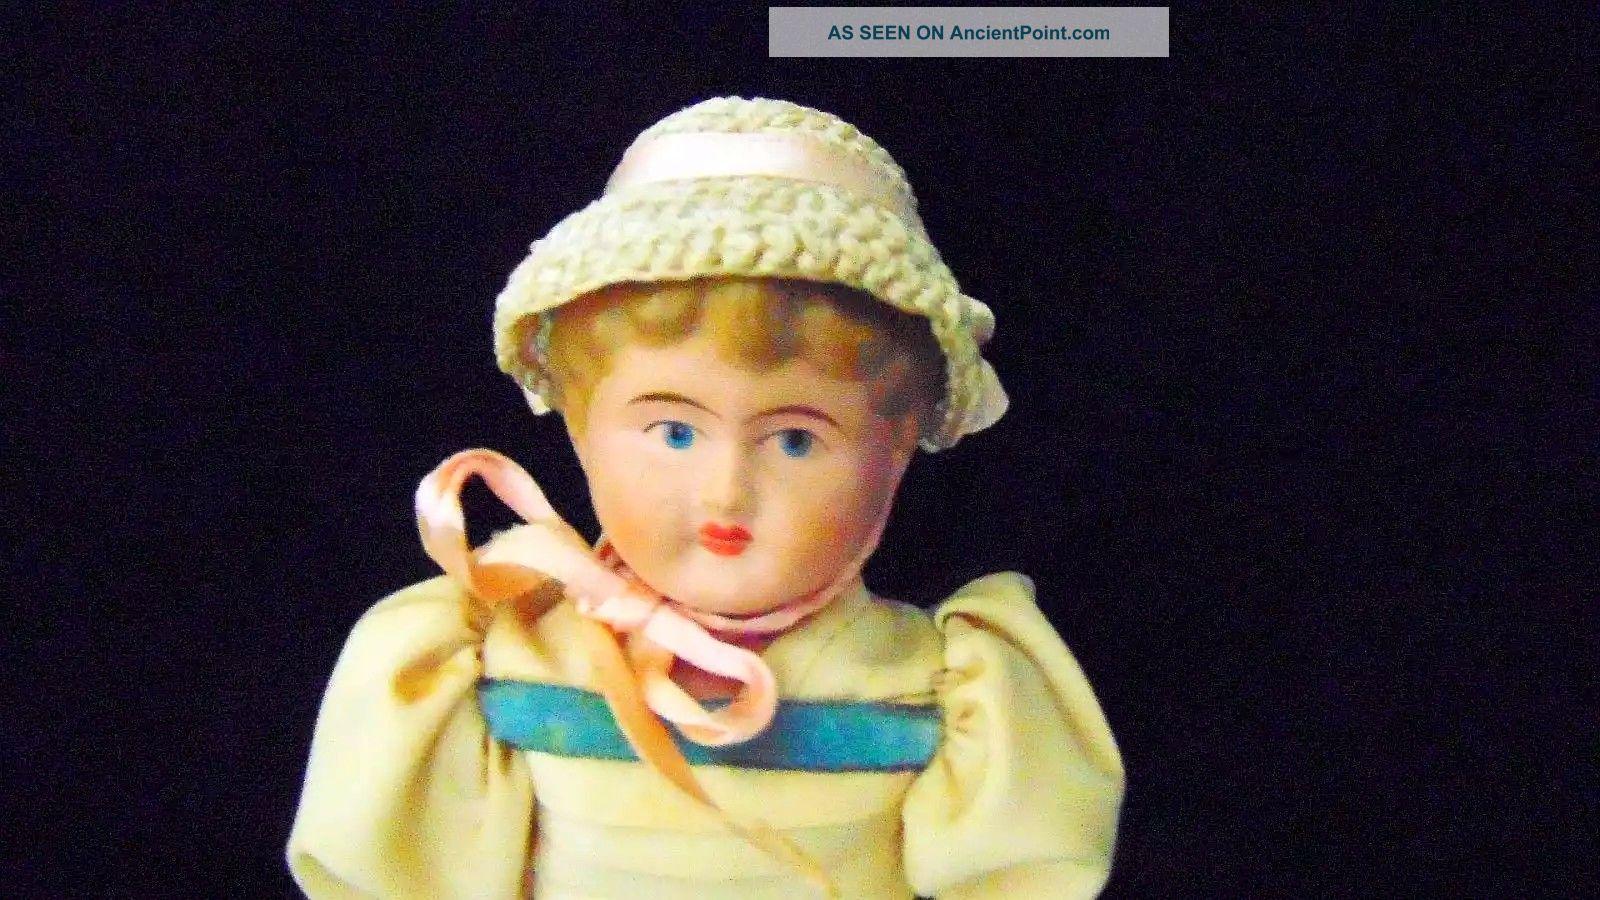 Antique Shoulder Head Doll German Fancy Clothing 11